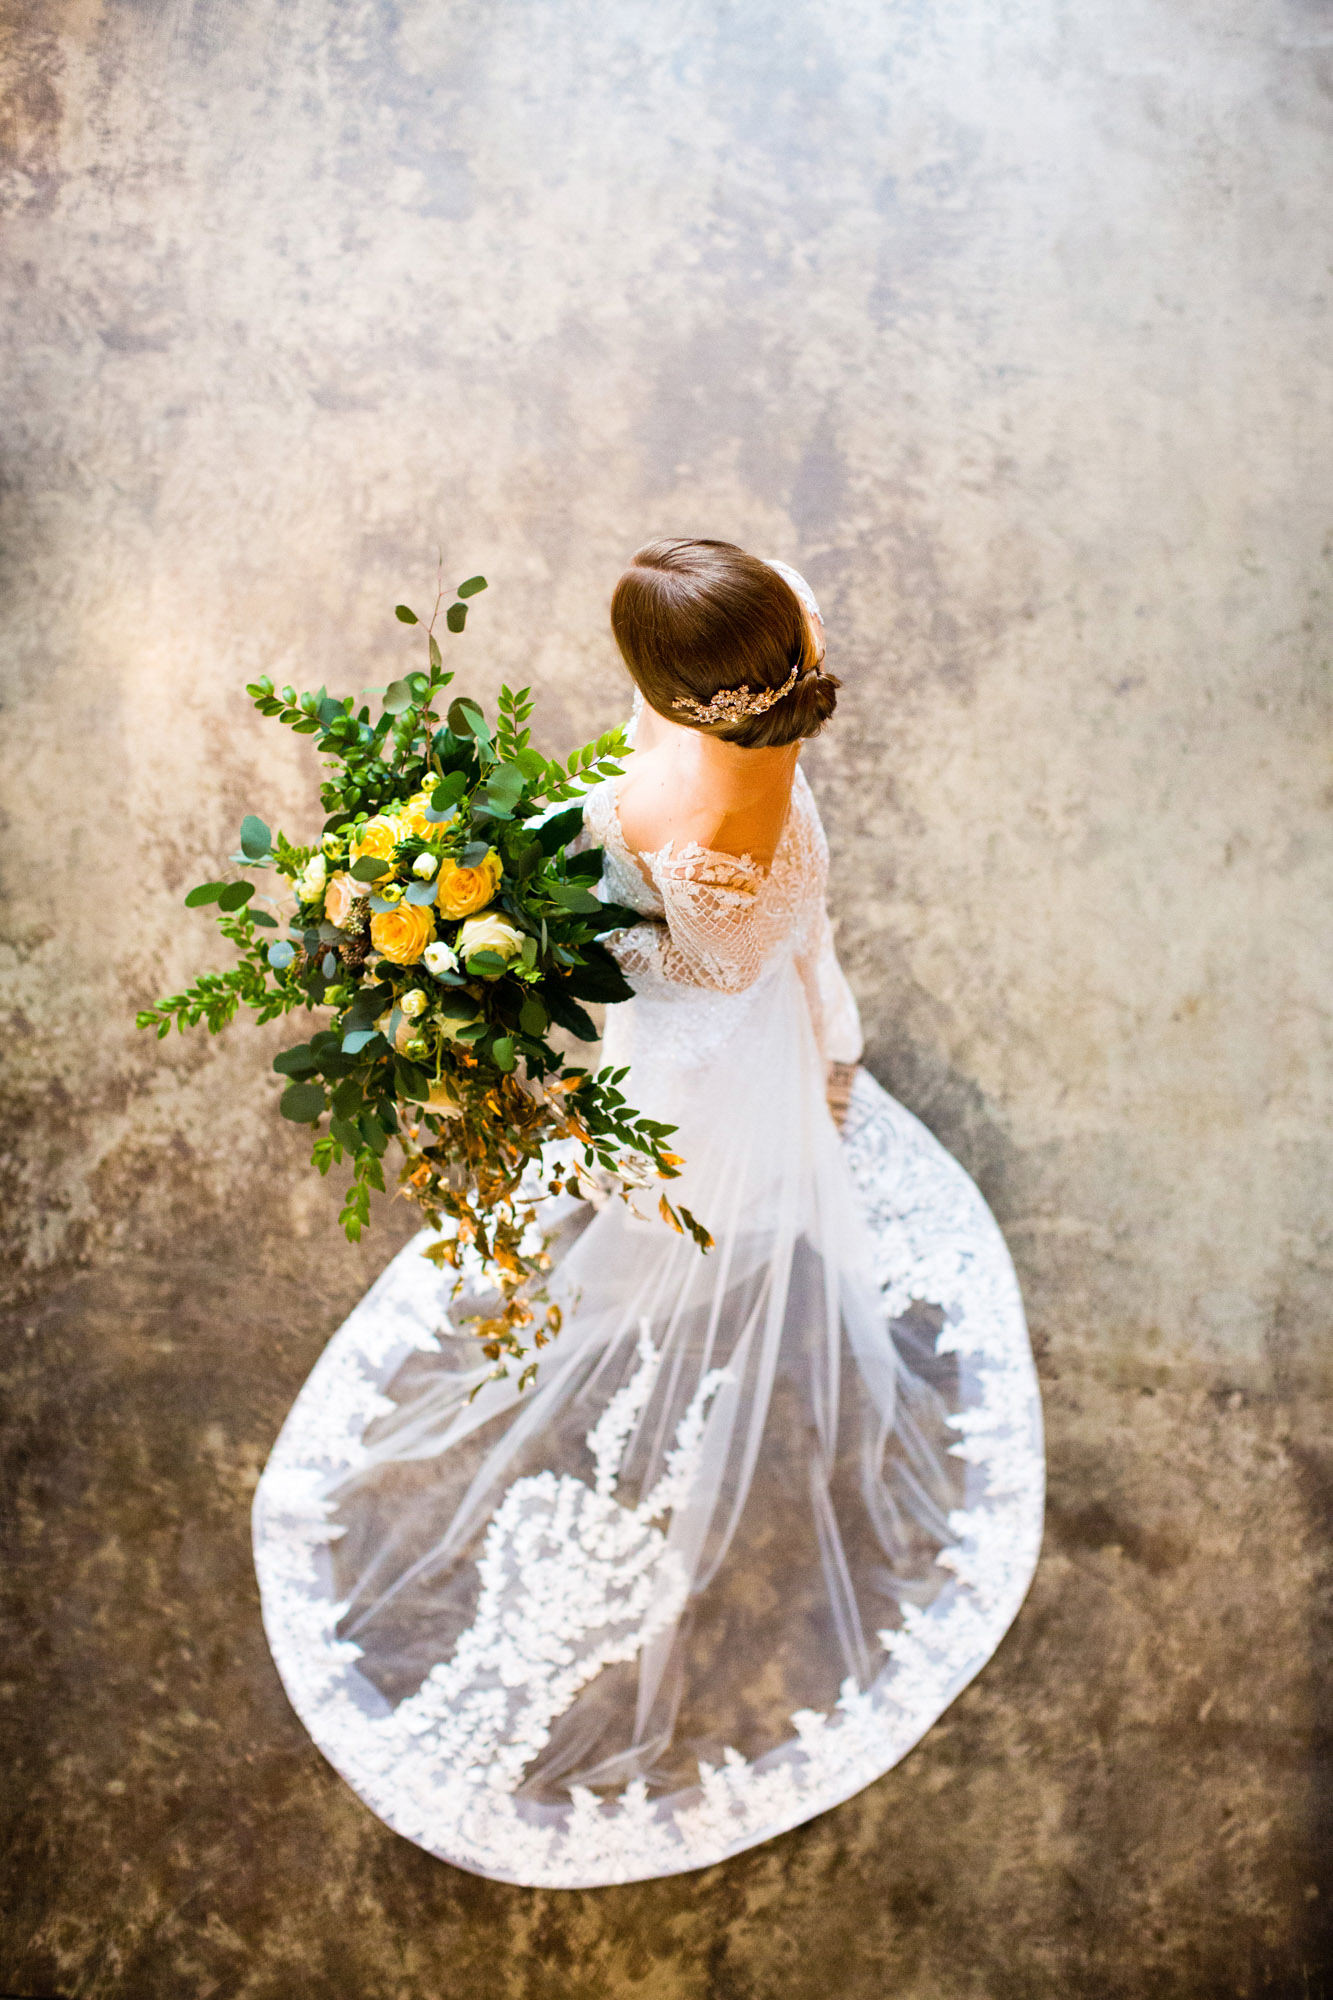 bride-from-above-lace-dress-yellow-rose-bouquet-worlds-best-wedding-photos-san-juan-island-photographers-la-vie-photo